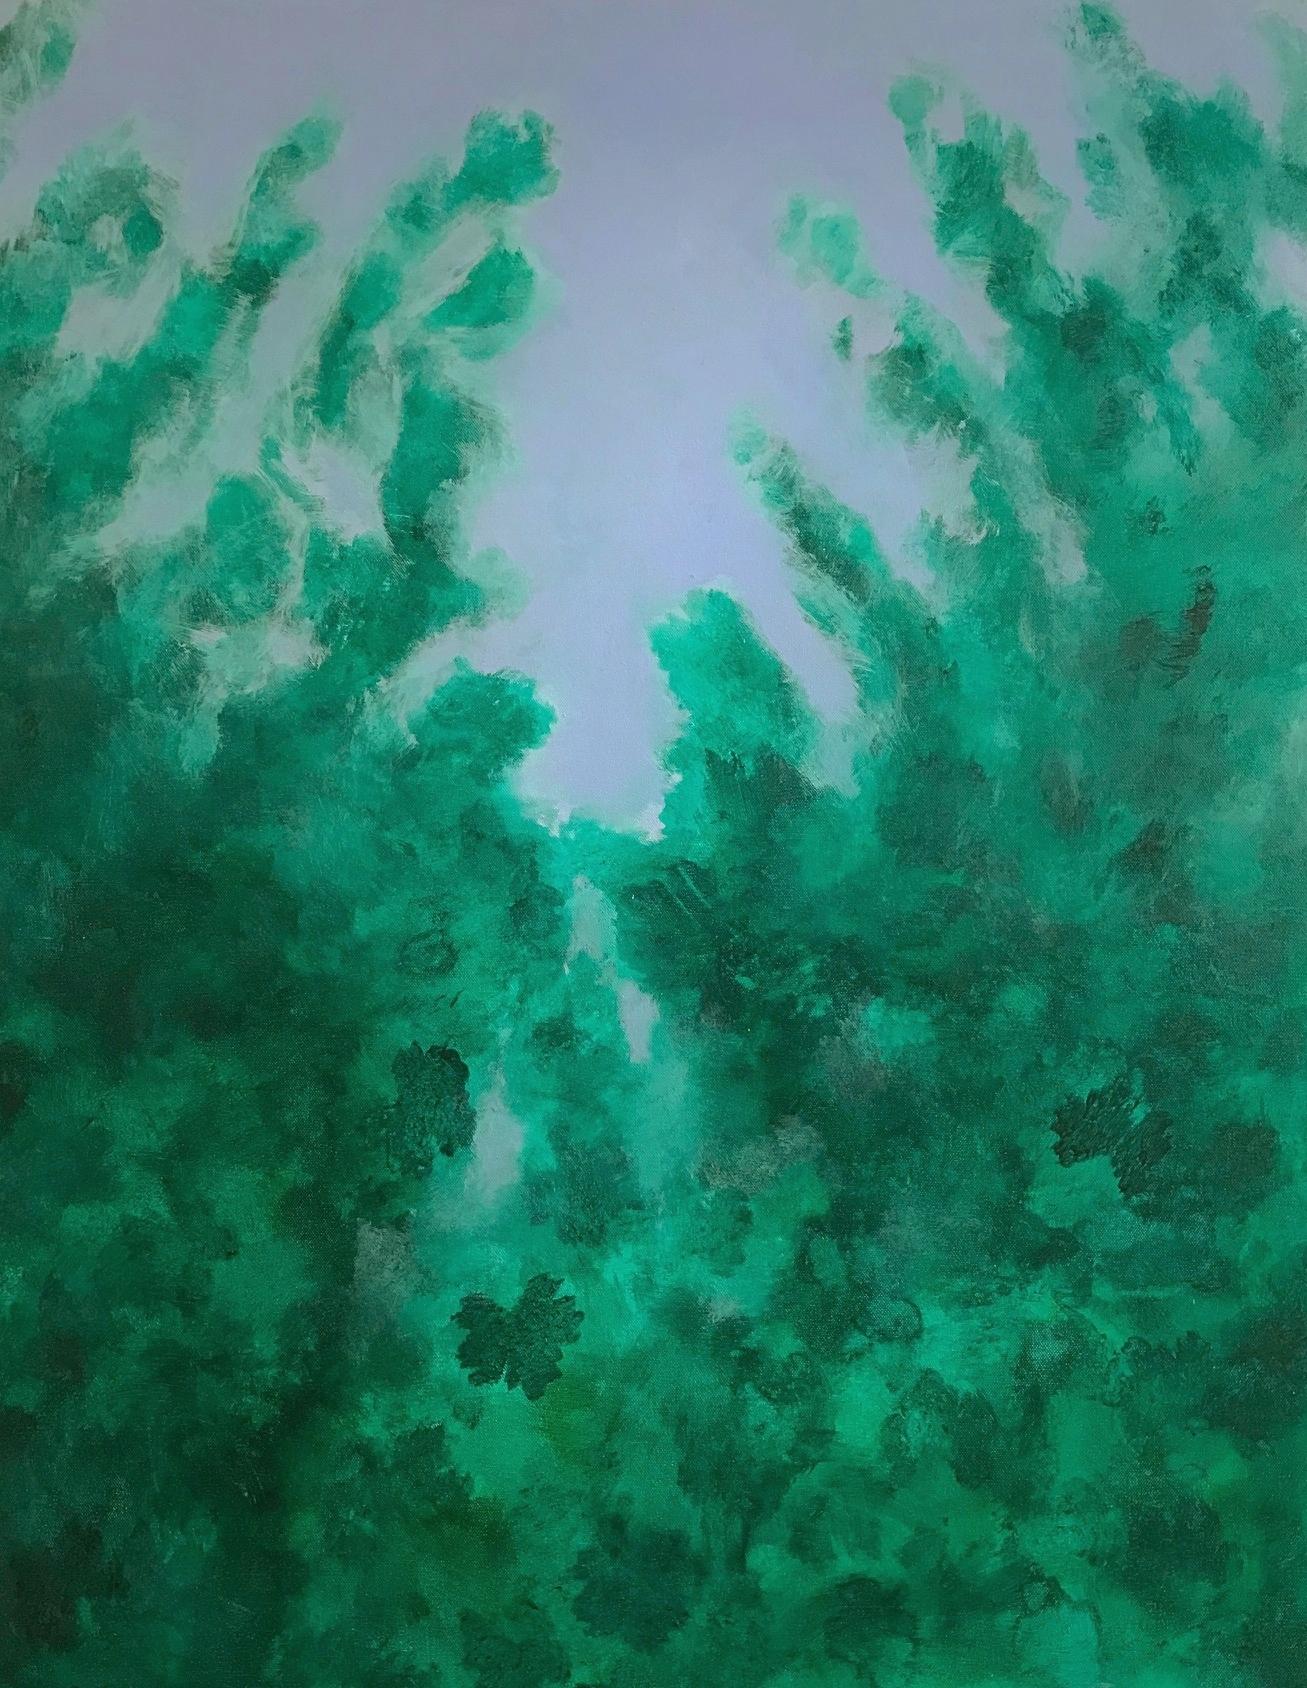 "Napa Summer   2015  40"" x 30"" (101.6 x 76.2 cm)  oil on canvas    $5,200"